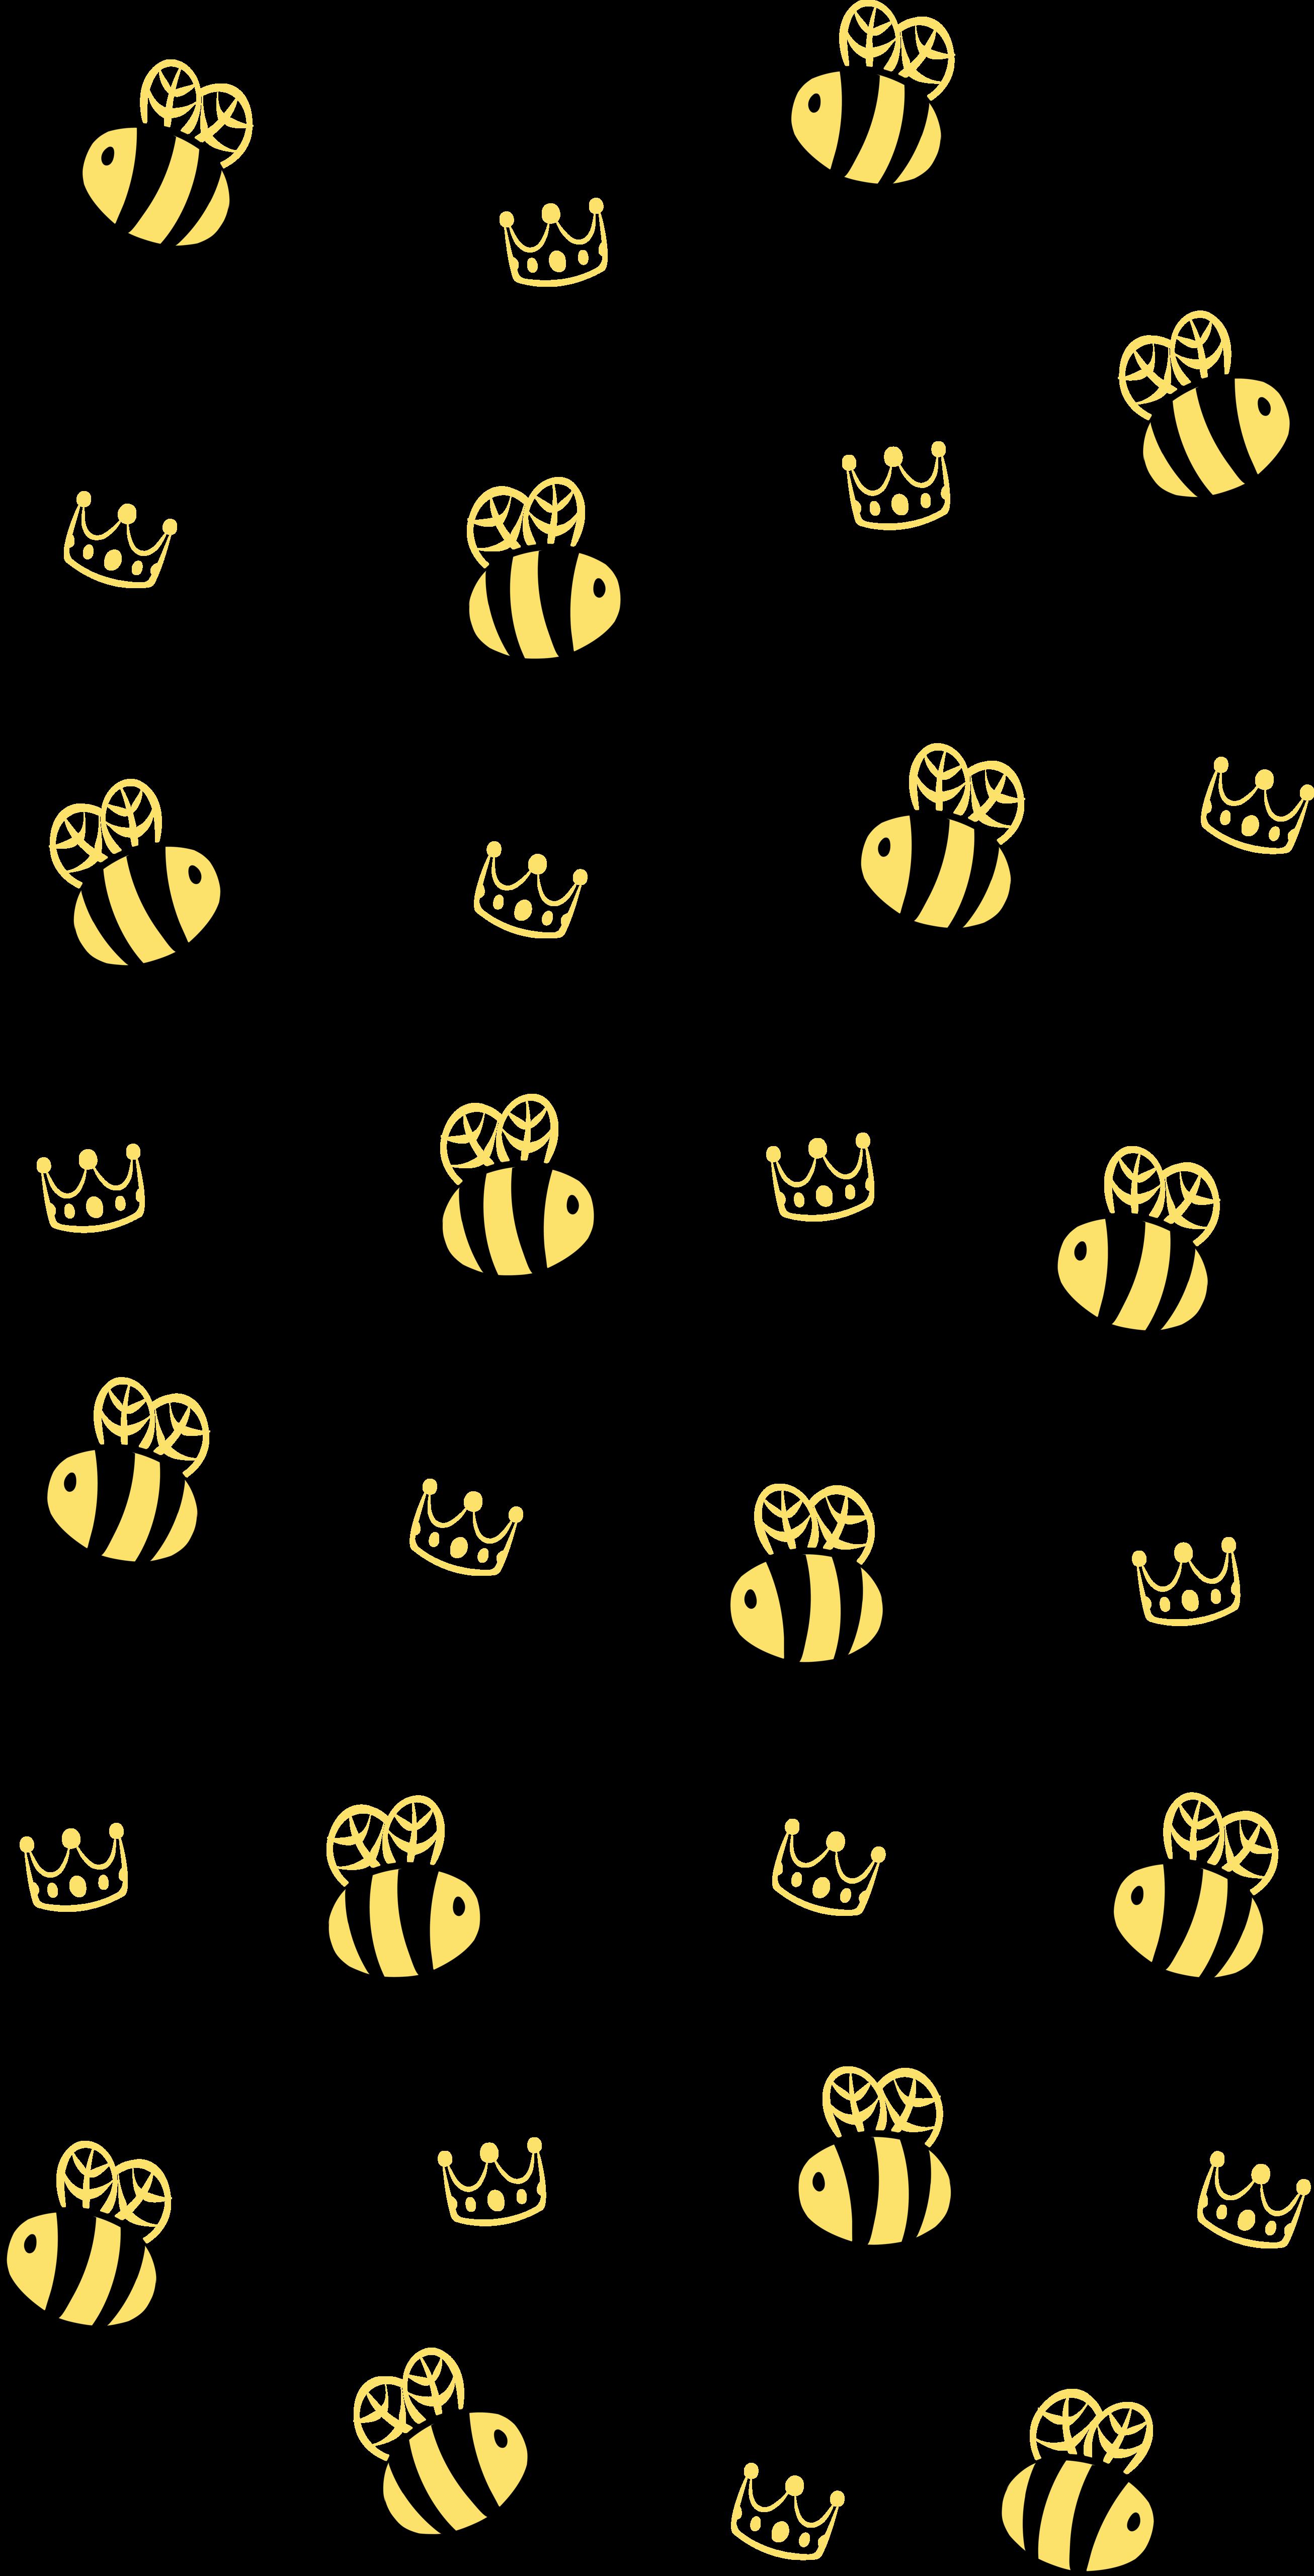 Casetify Iphone Art Design Illustration Nature Animals Wallpaper Iphone Cute Cute Disney Wallpaper Homescreen Wallpaper